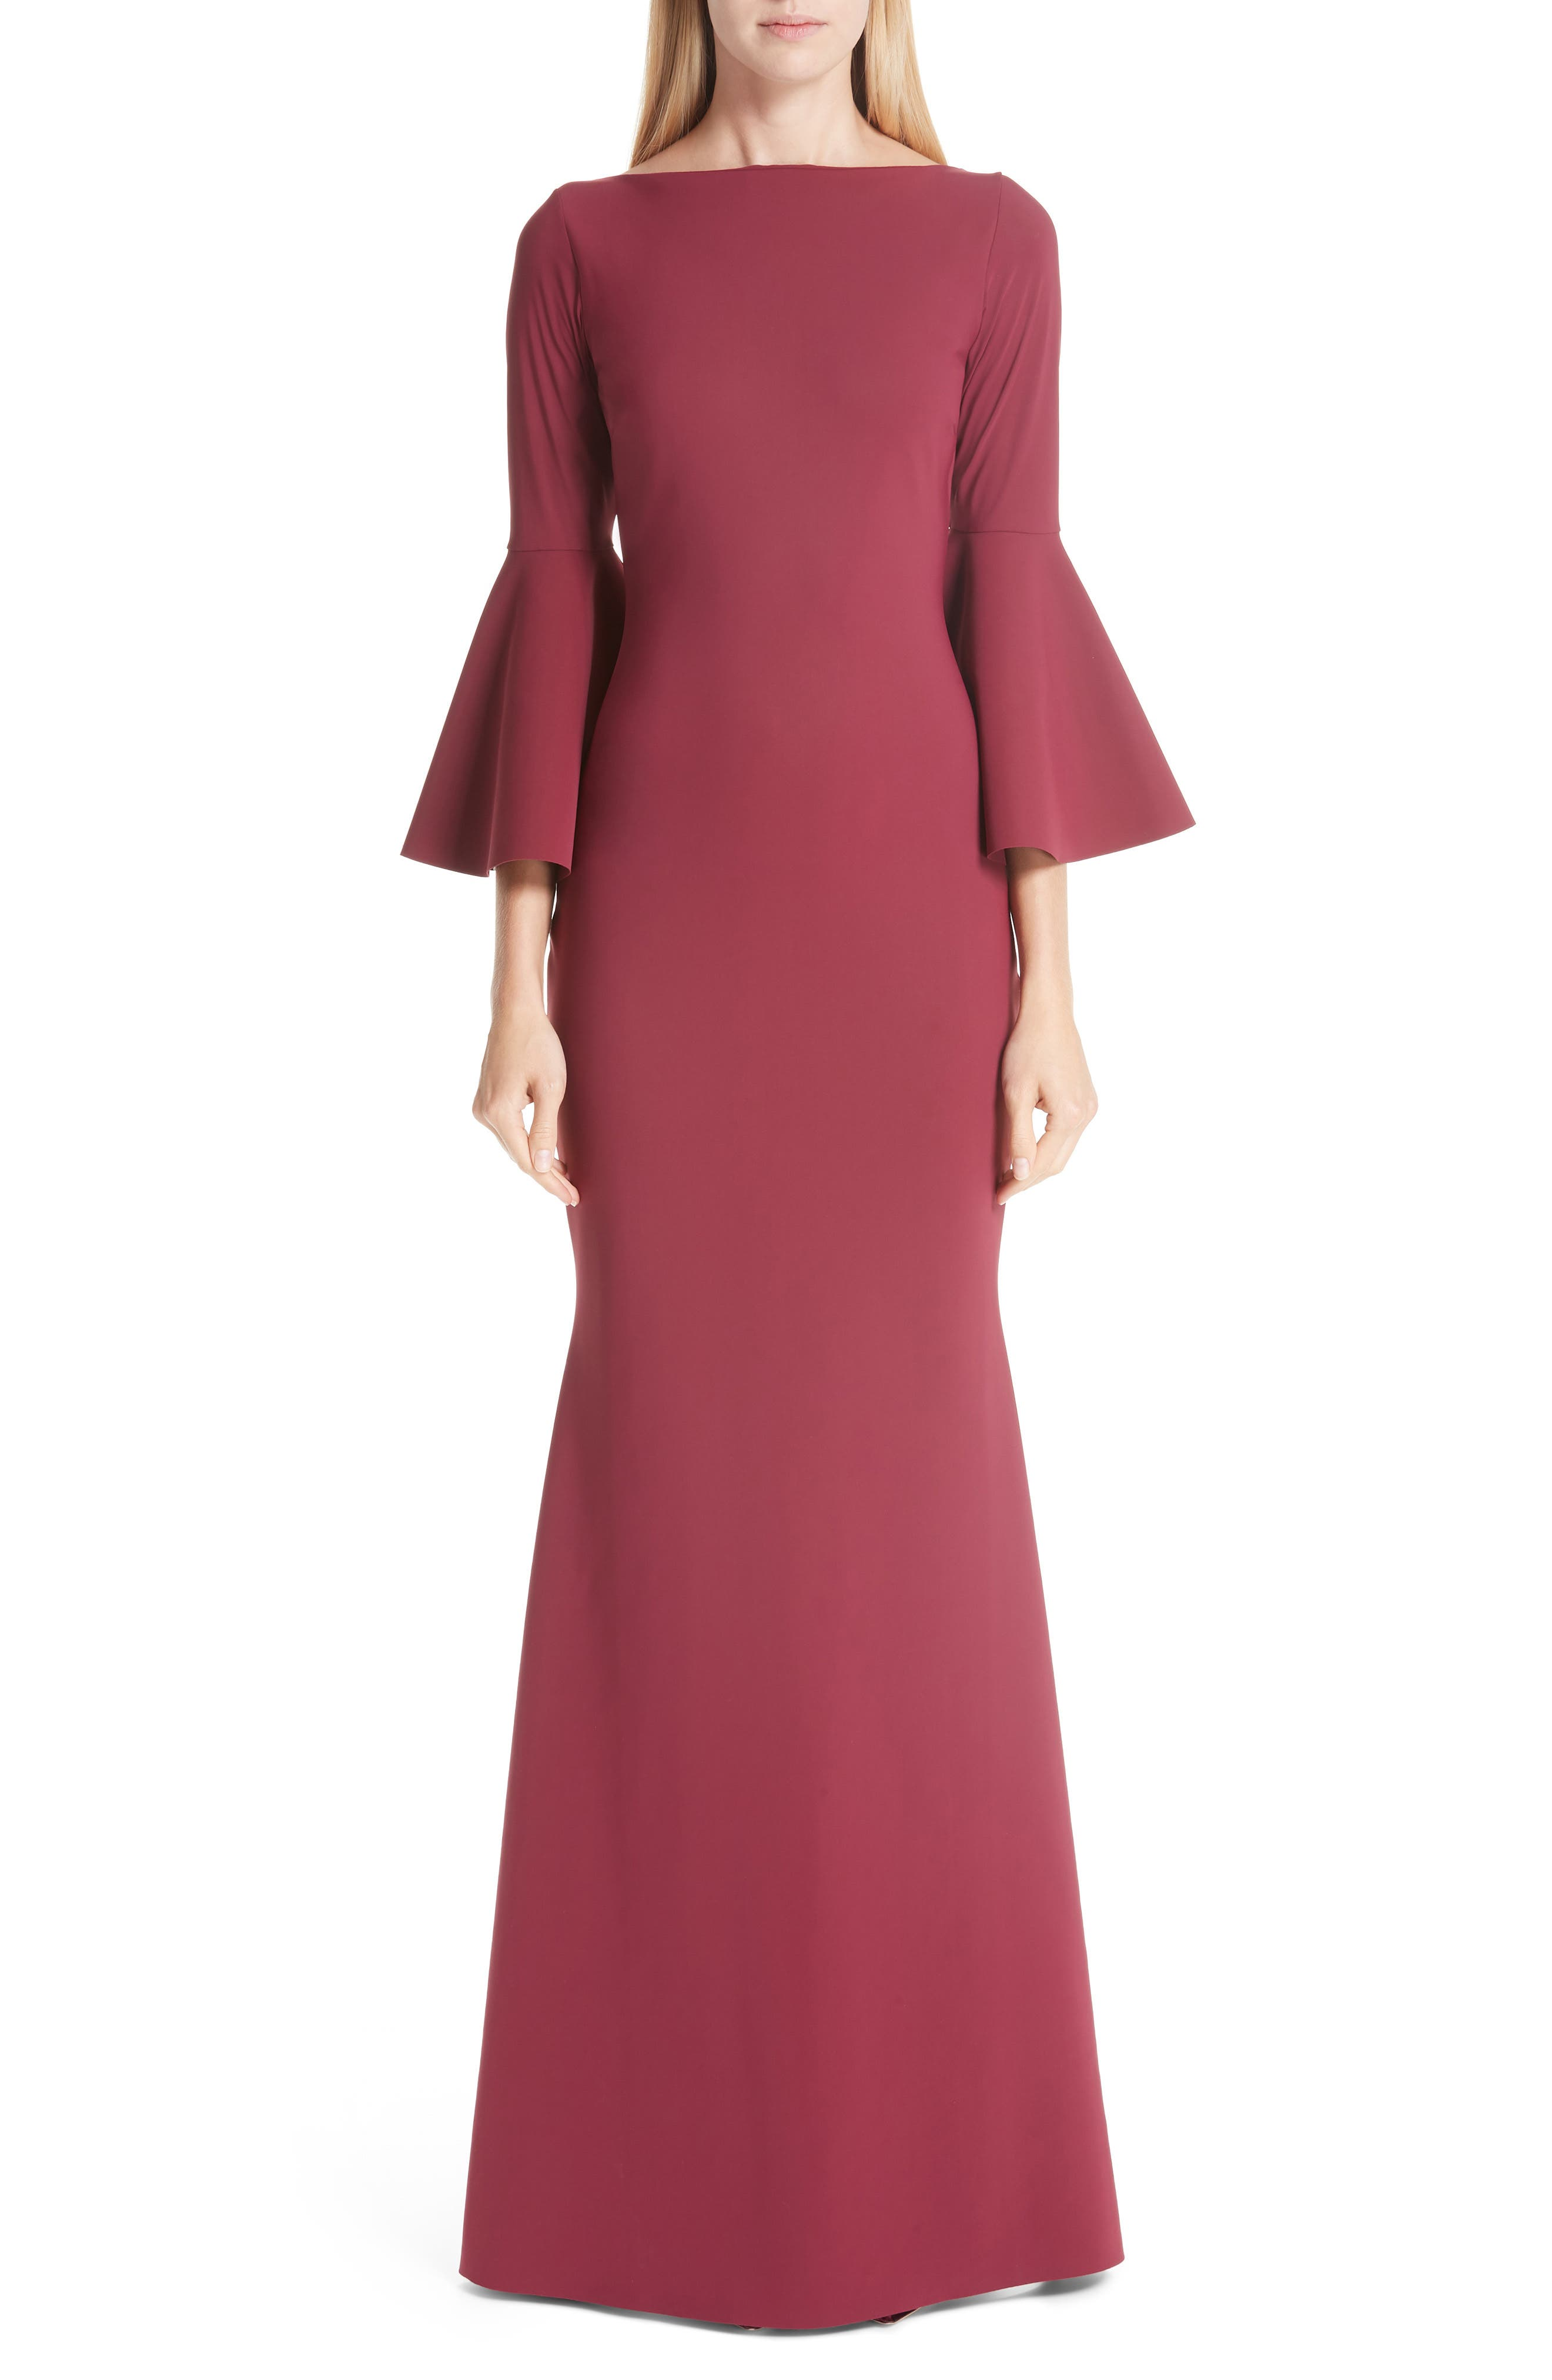 Chiara Boni La Petite Robe Iva Bell Sleeve Evening Dress, US / 40 IT - Red